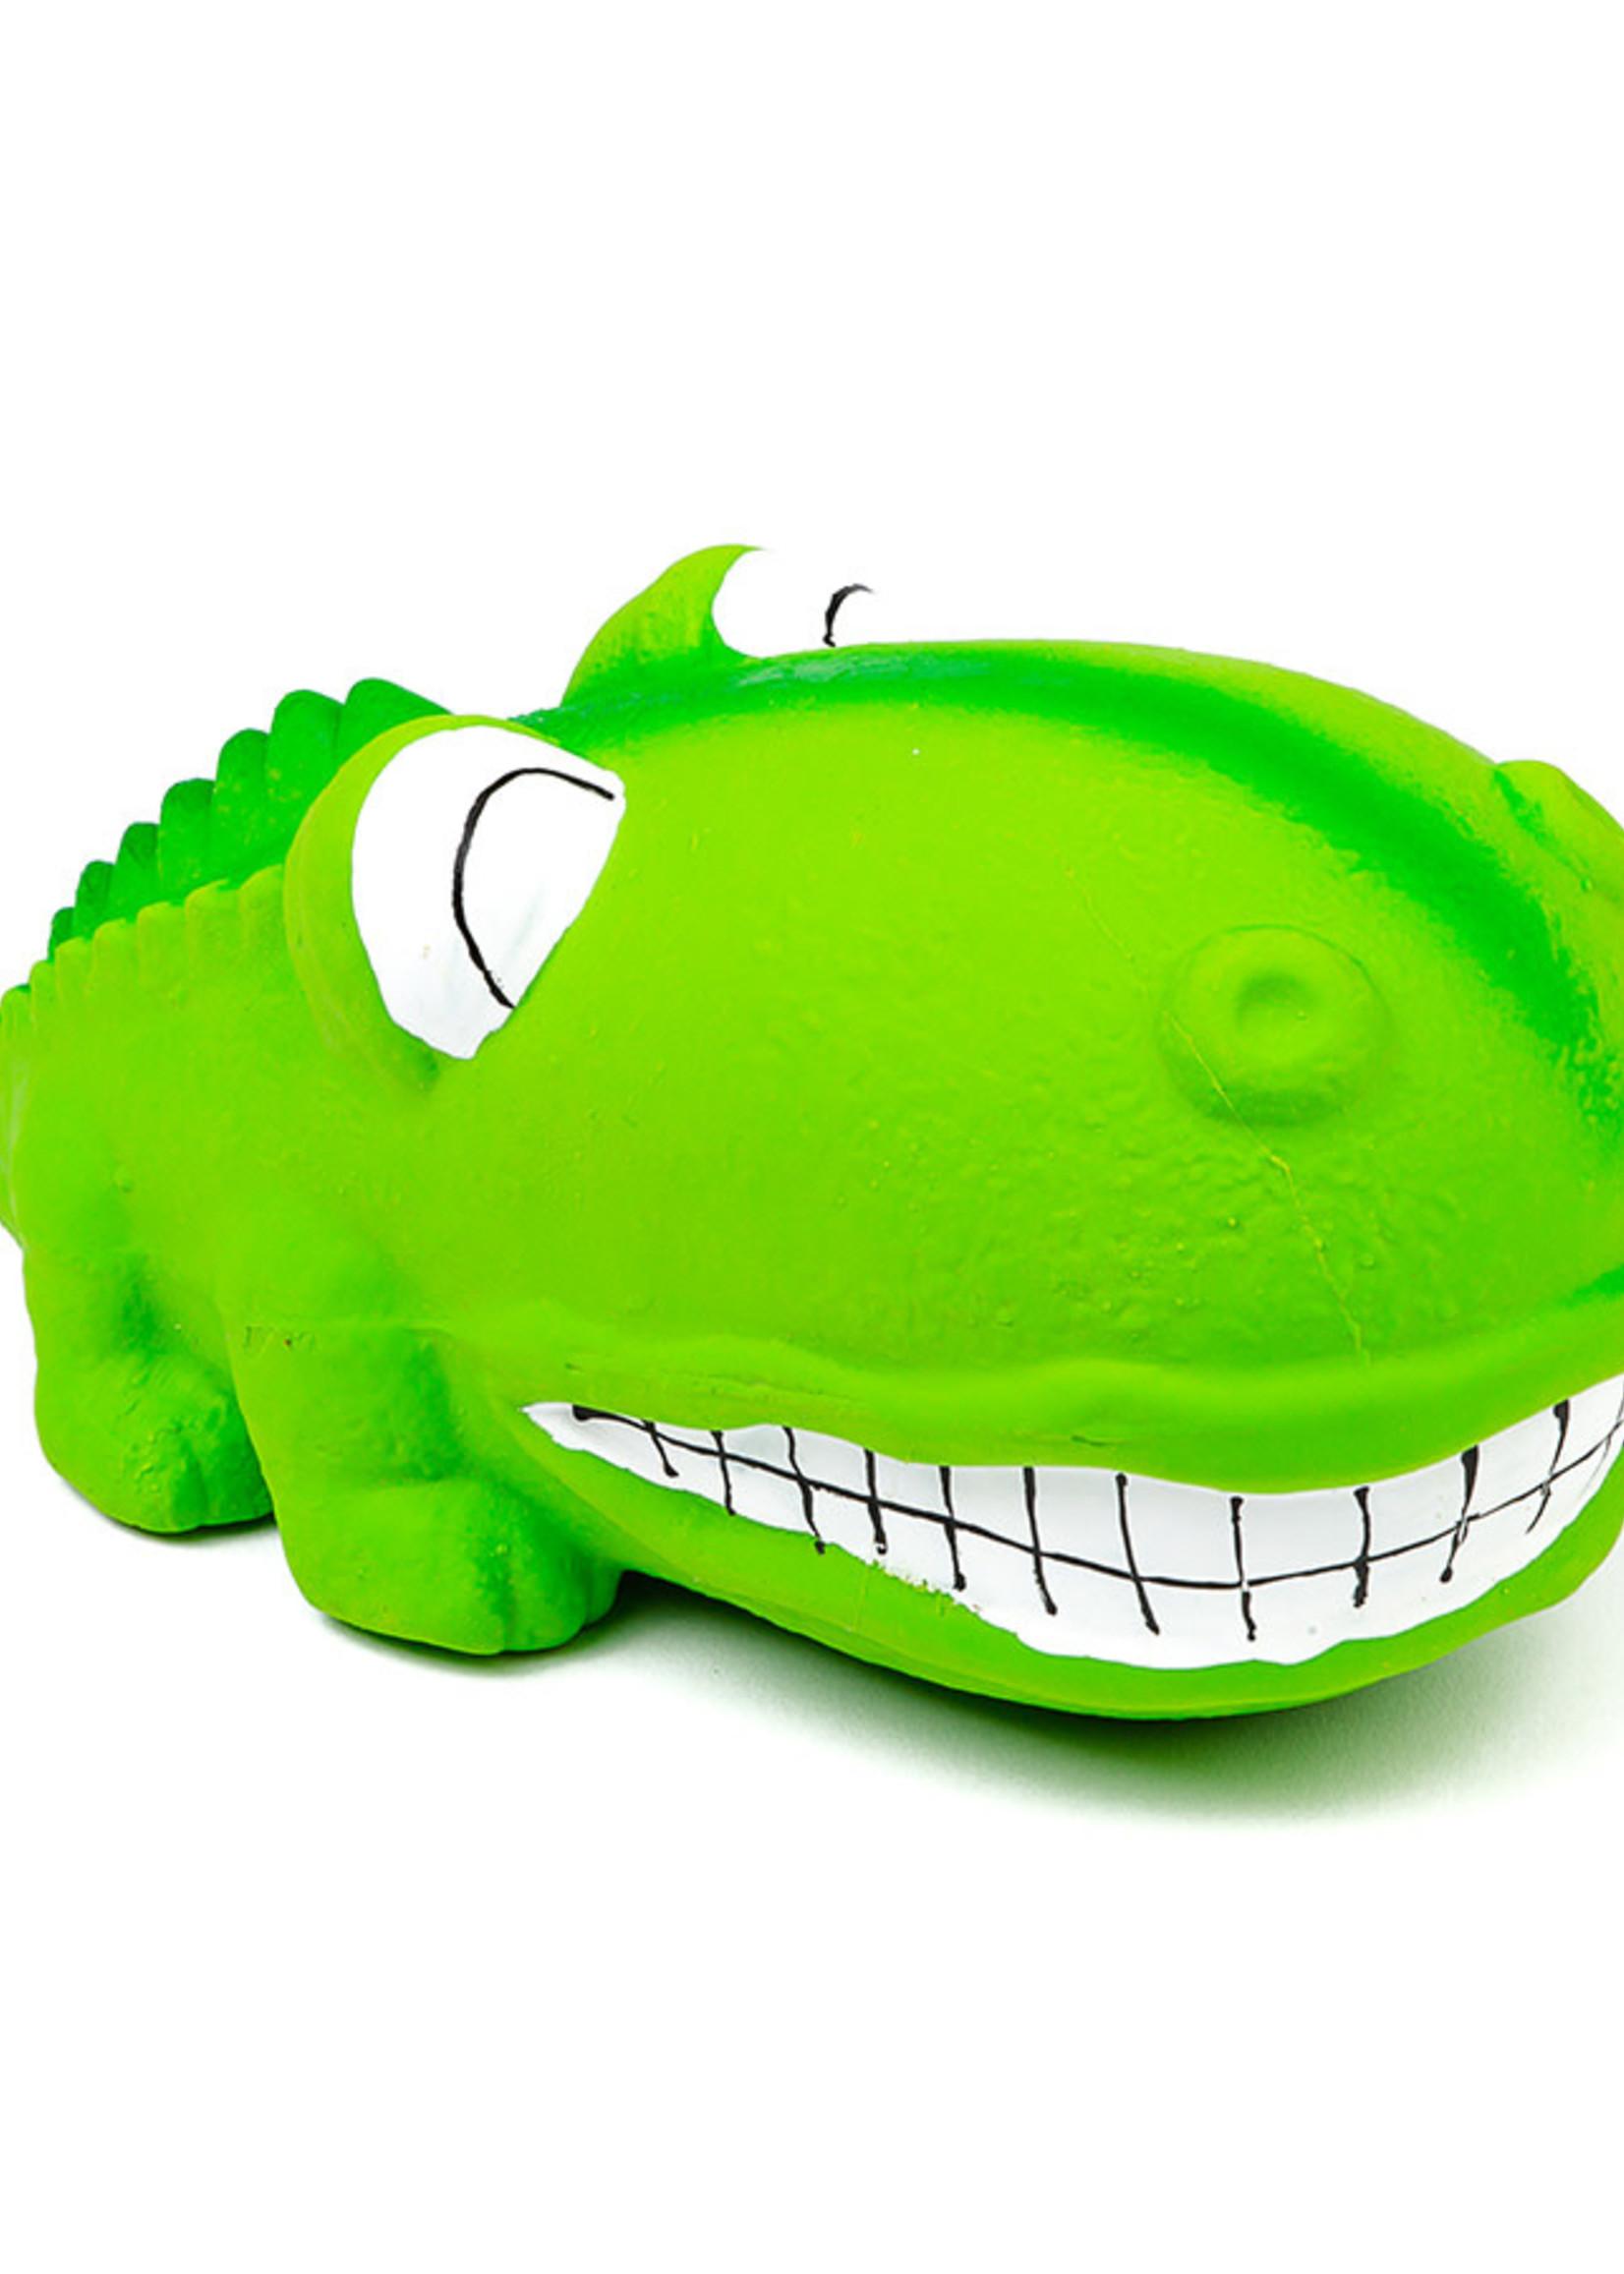 "Budz Latex Big Snout Dog Toy -Alligator 7"" Green"